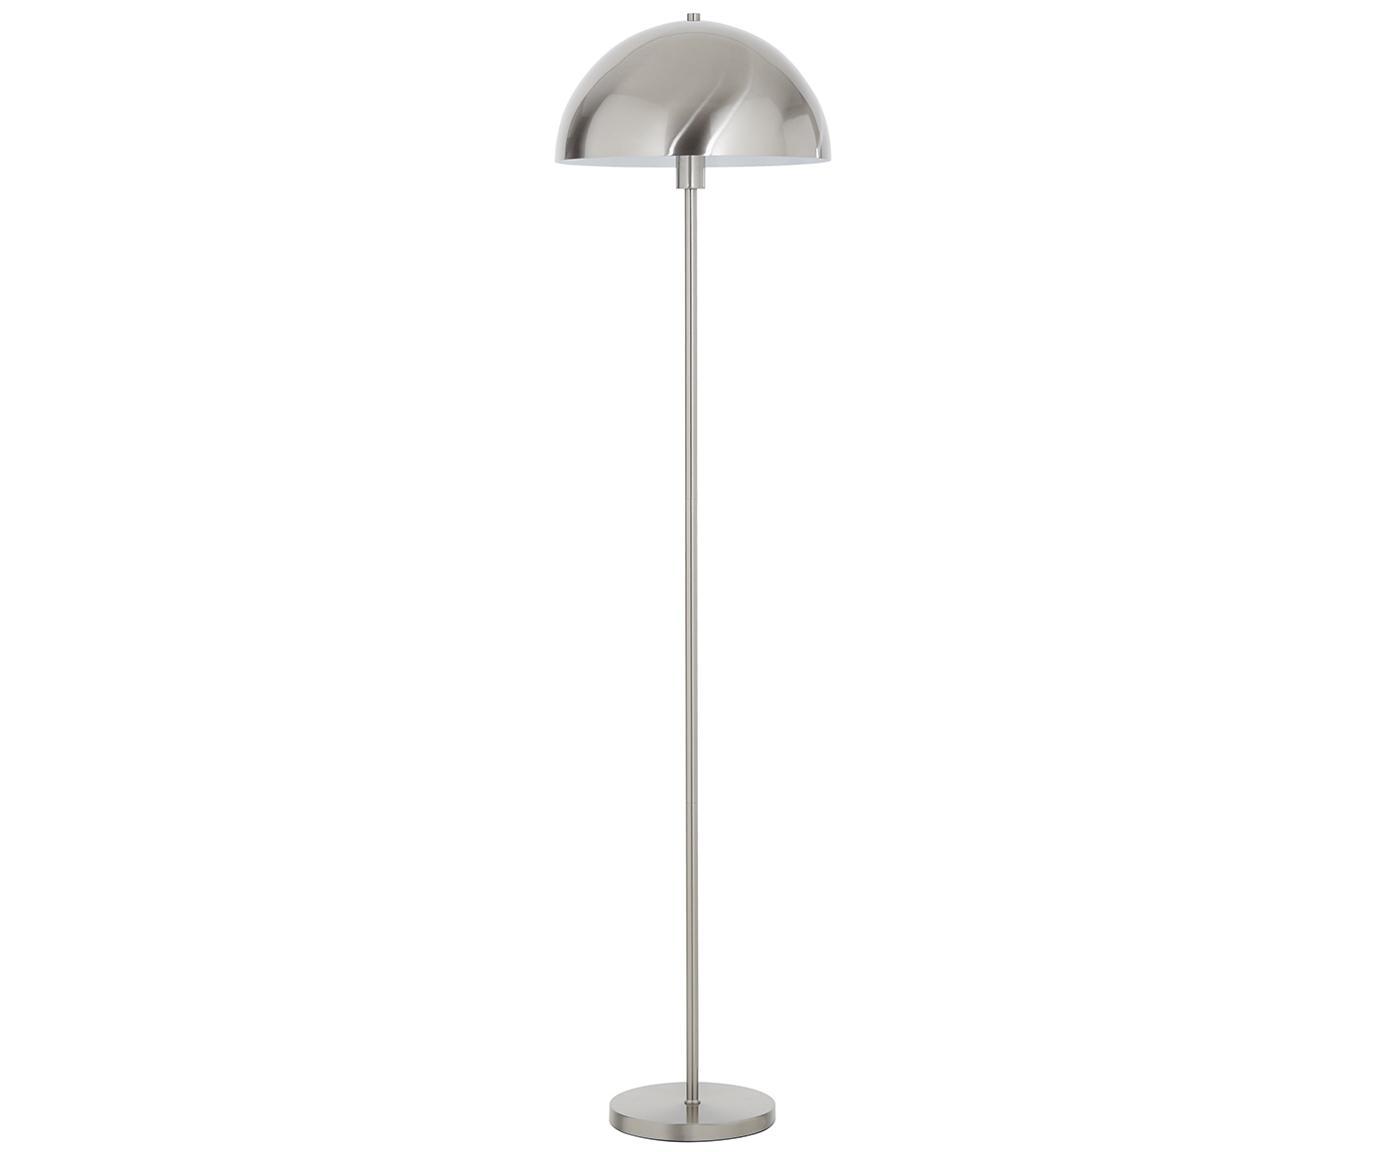 Stehlampe Matilda, Lampenschirm: Metall, gebürstet, Lampenfuß: Metall, gebürstet, Silberfarben, Ø 40 x H 164 cm